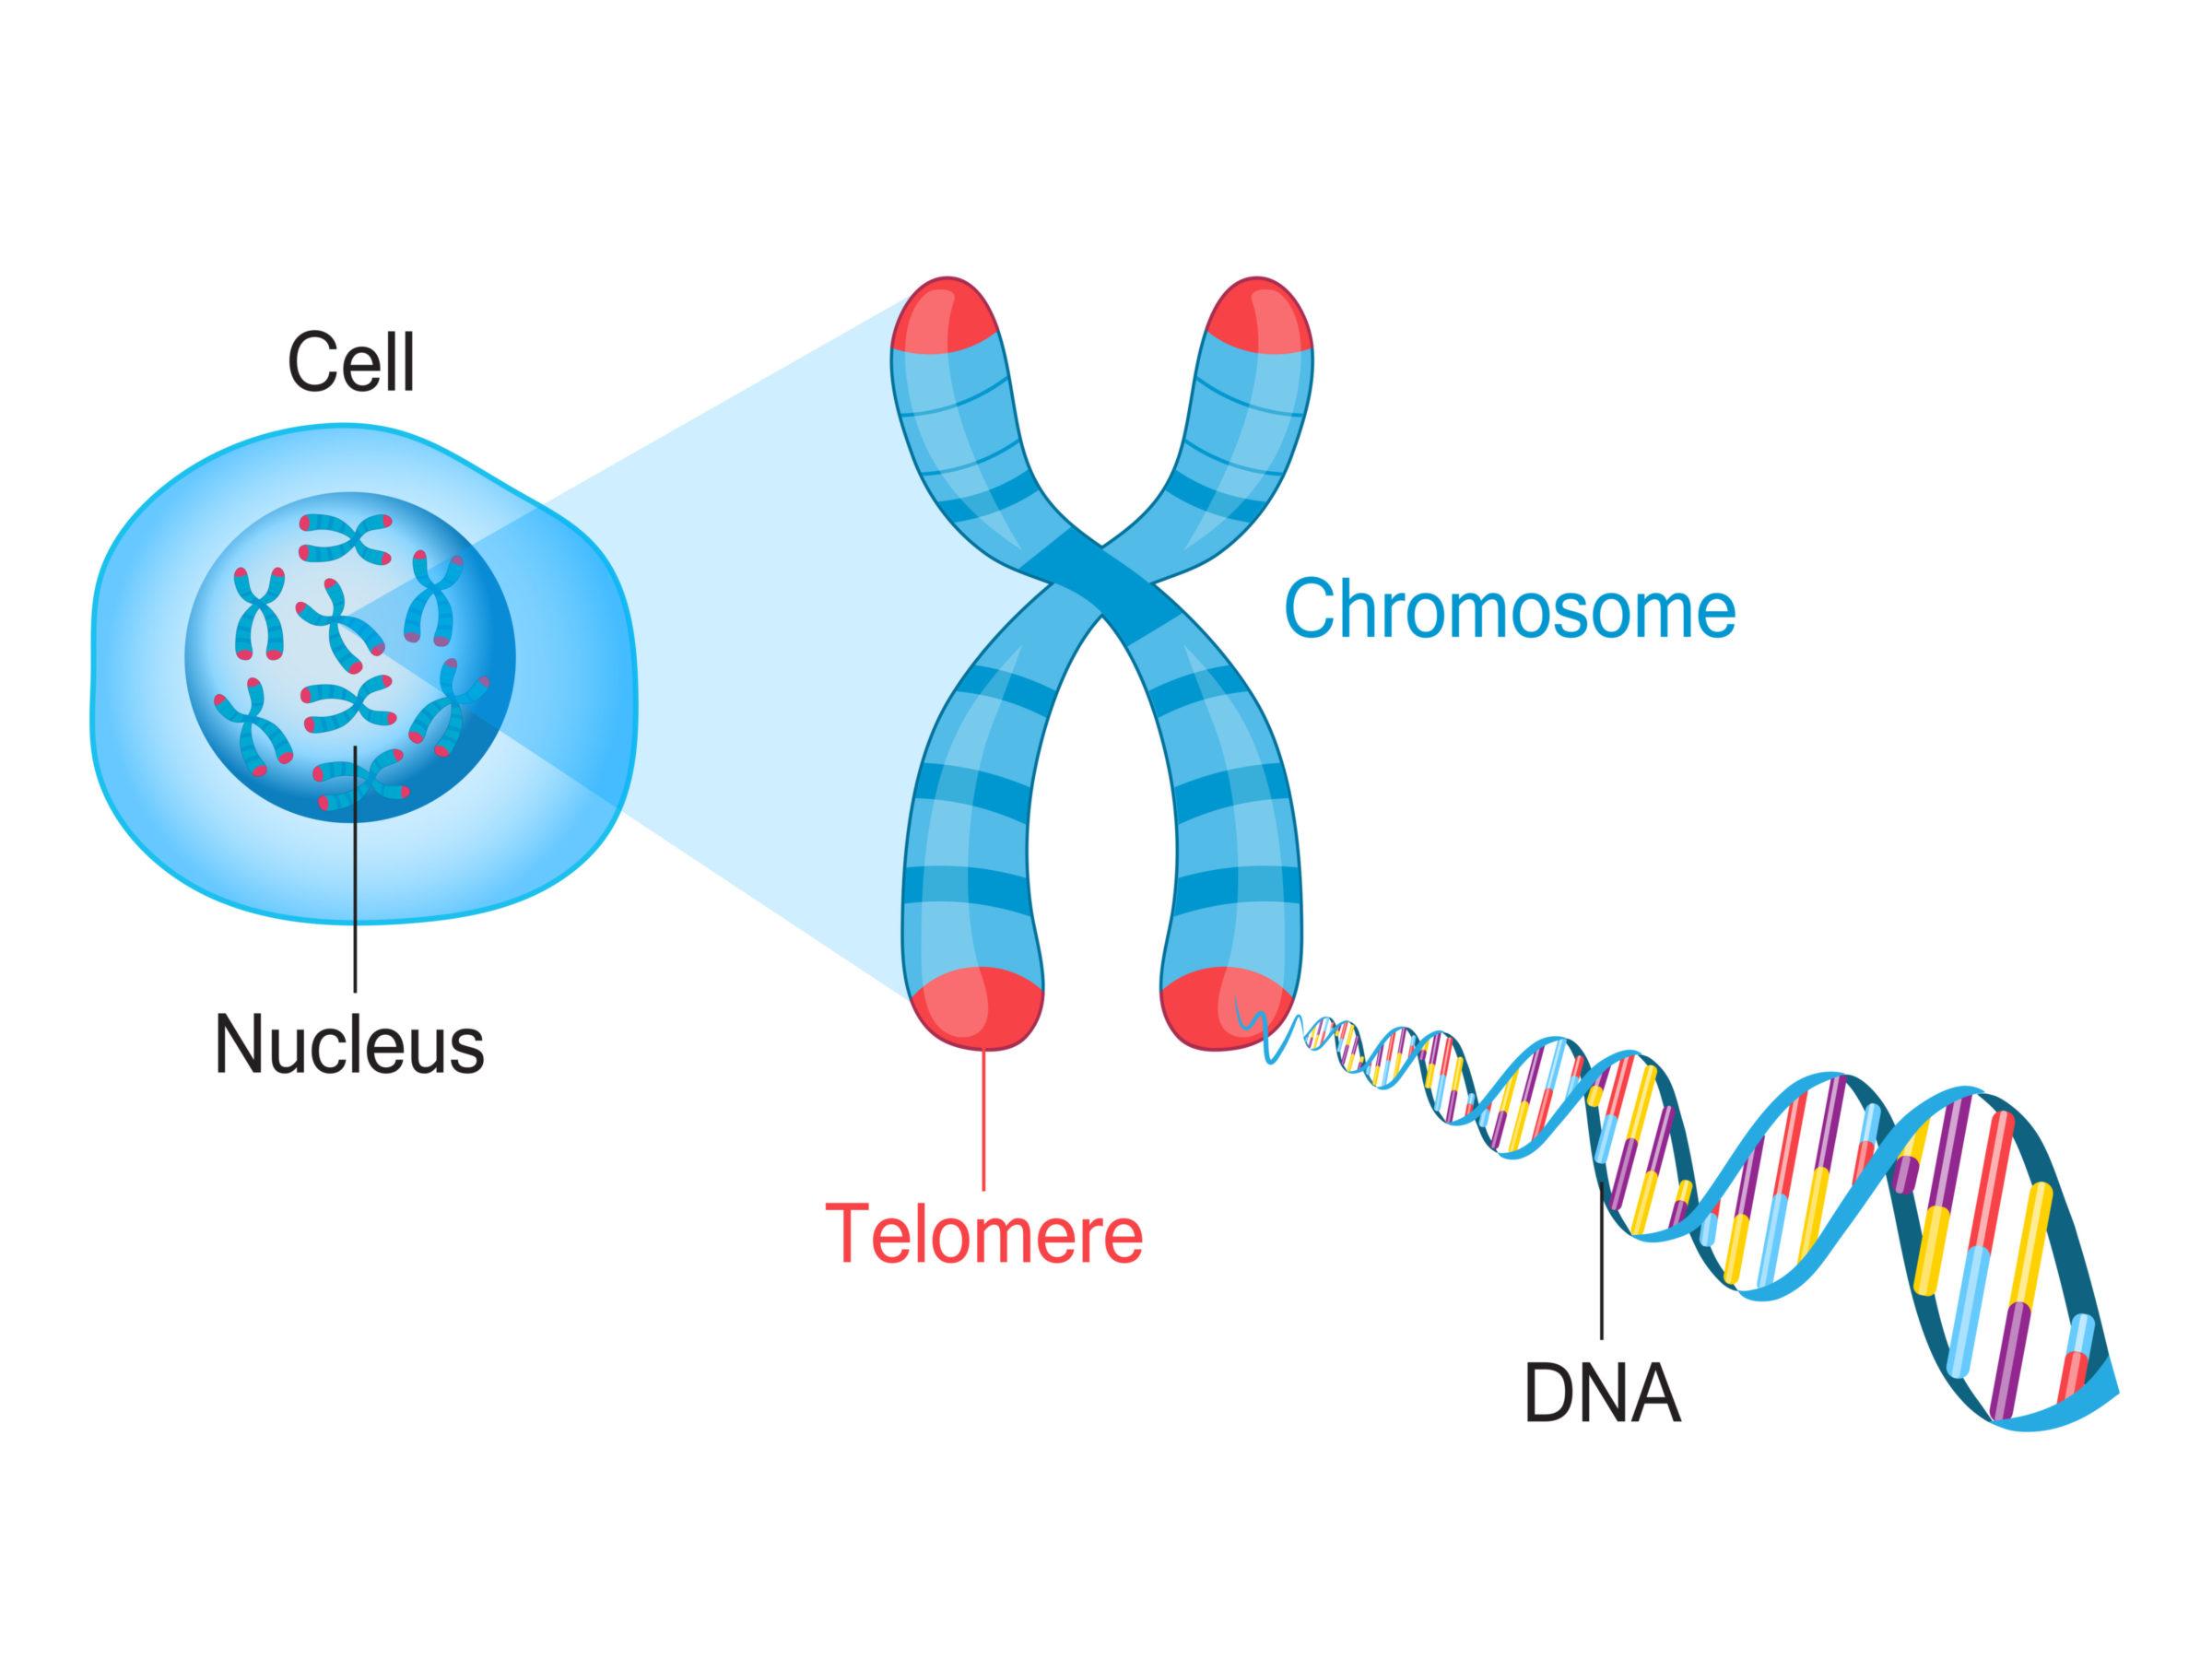 Telomere